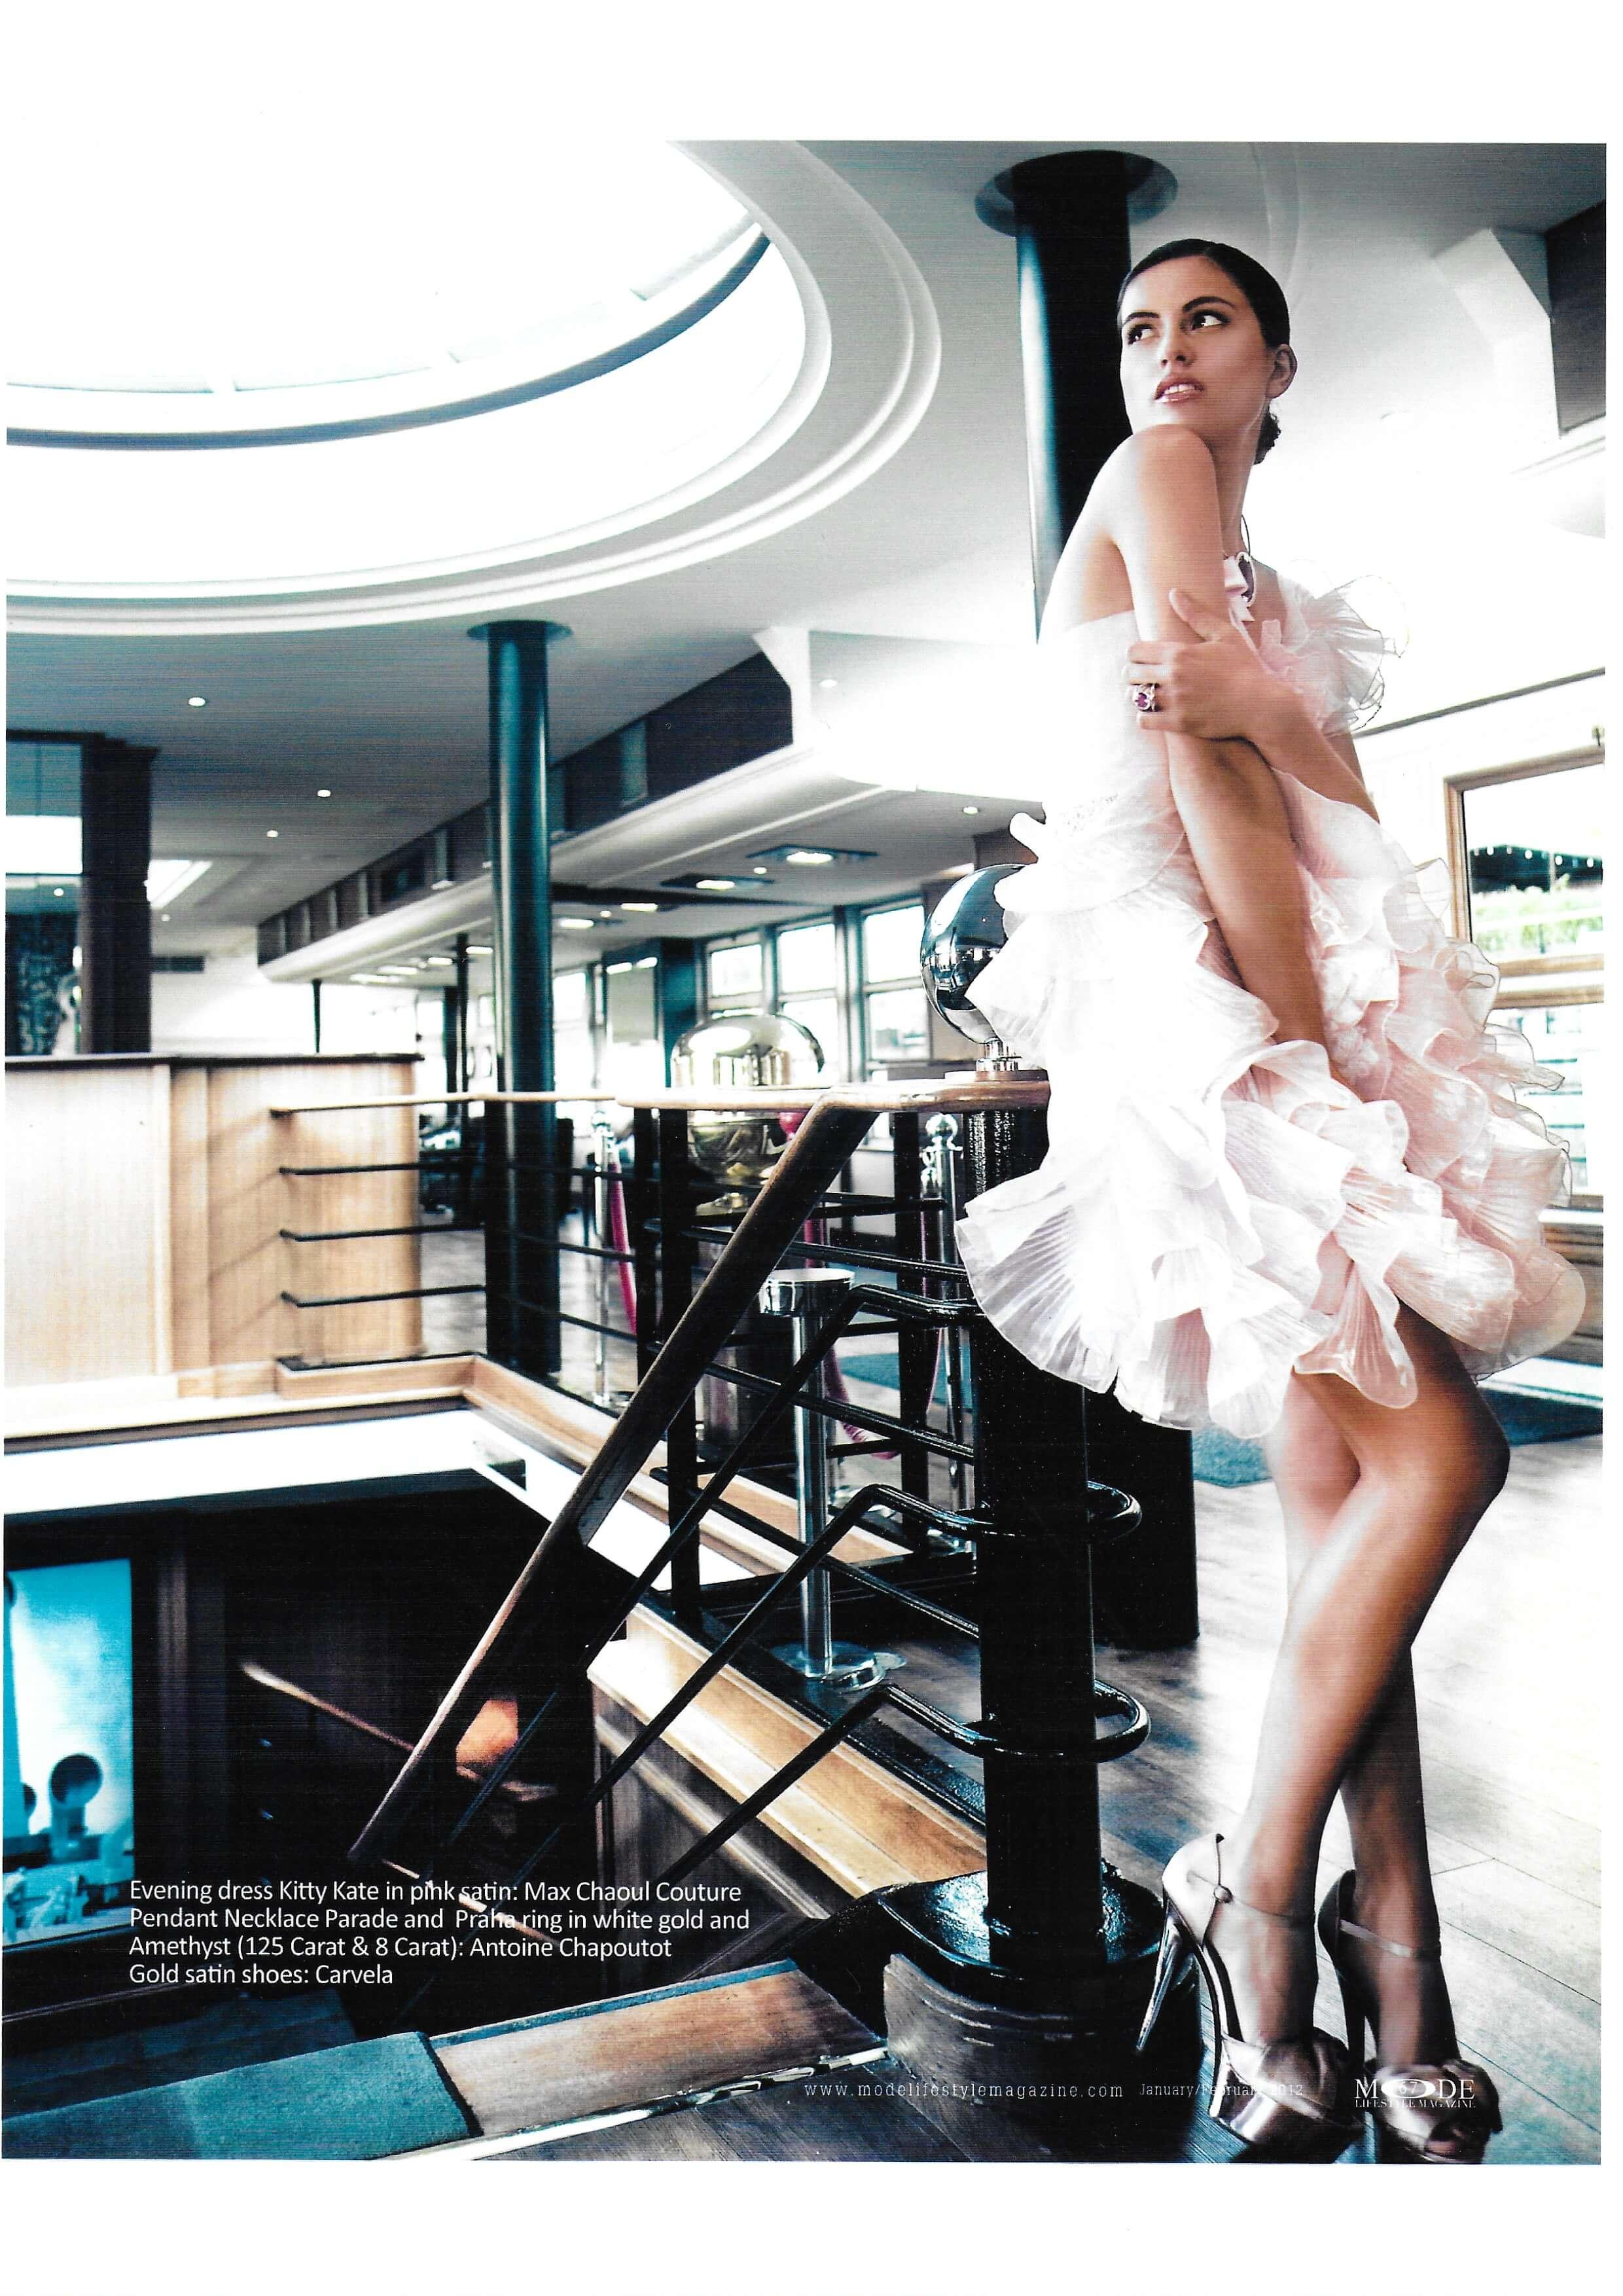 2012 Mode Lifestyle Magazine janv 2012 6.jpg